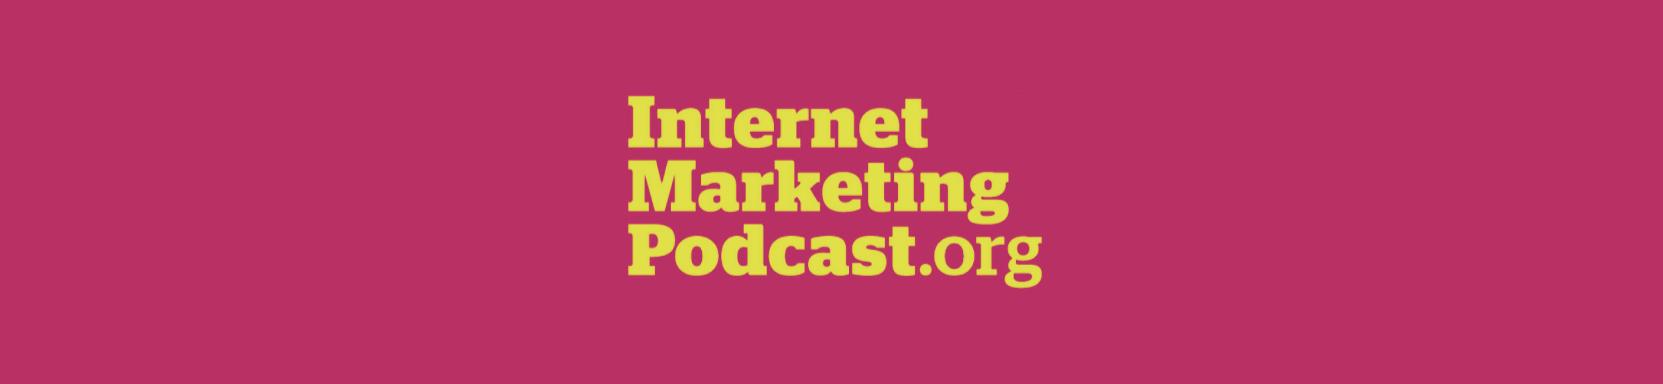 Internet Marketing Podcast